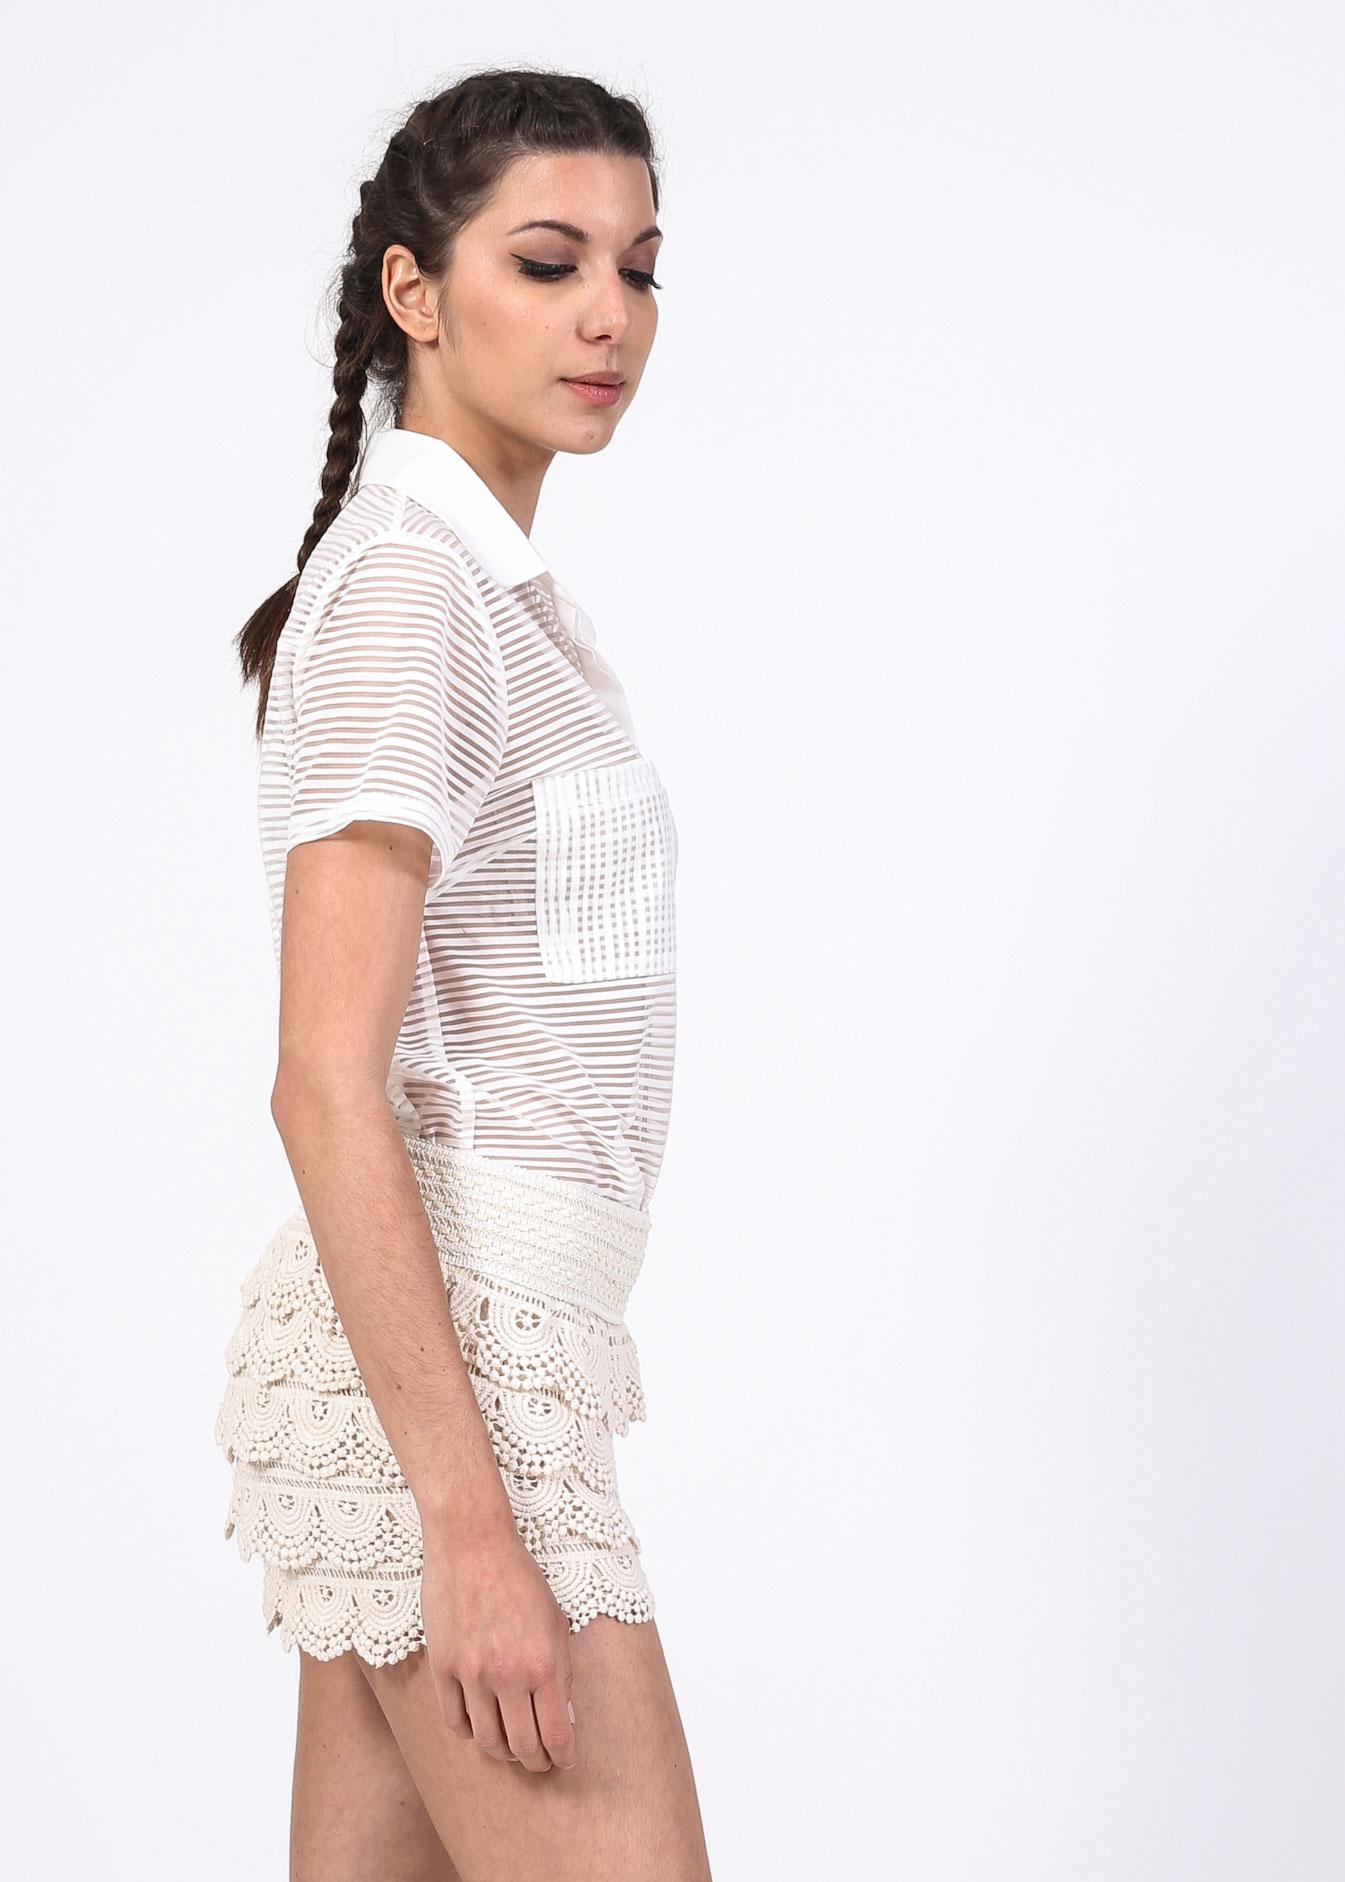 Loulou polo crop πουκάμισο, λευκό ρούχα